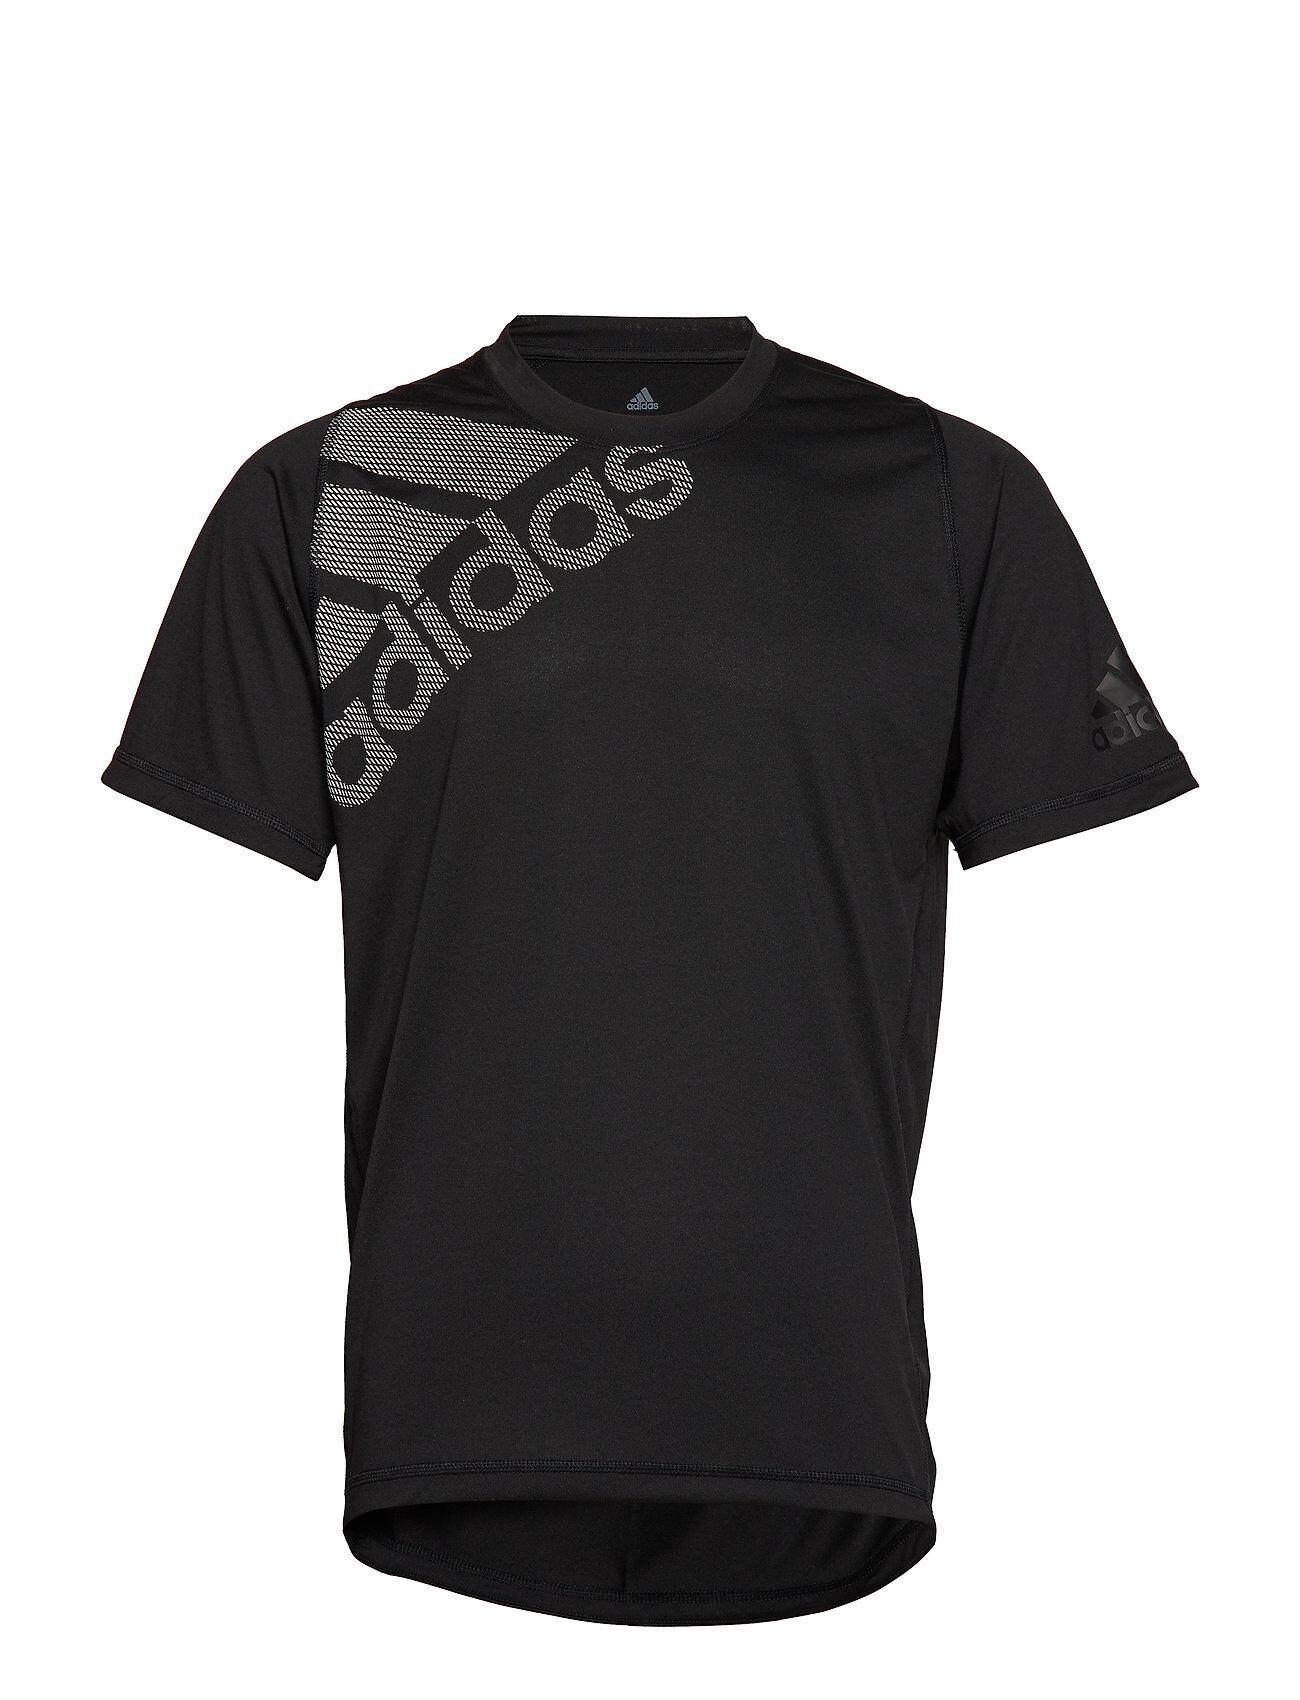 Image of adidas Performance Fl_spr Gf Bos T-shirts Short-sleeved Musta Adidas Performance